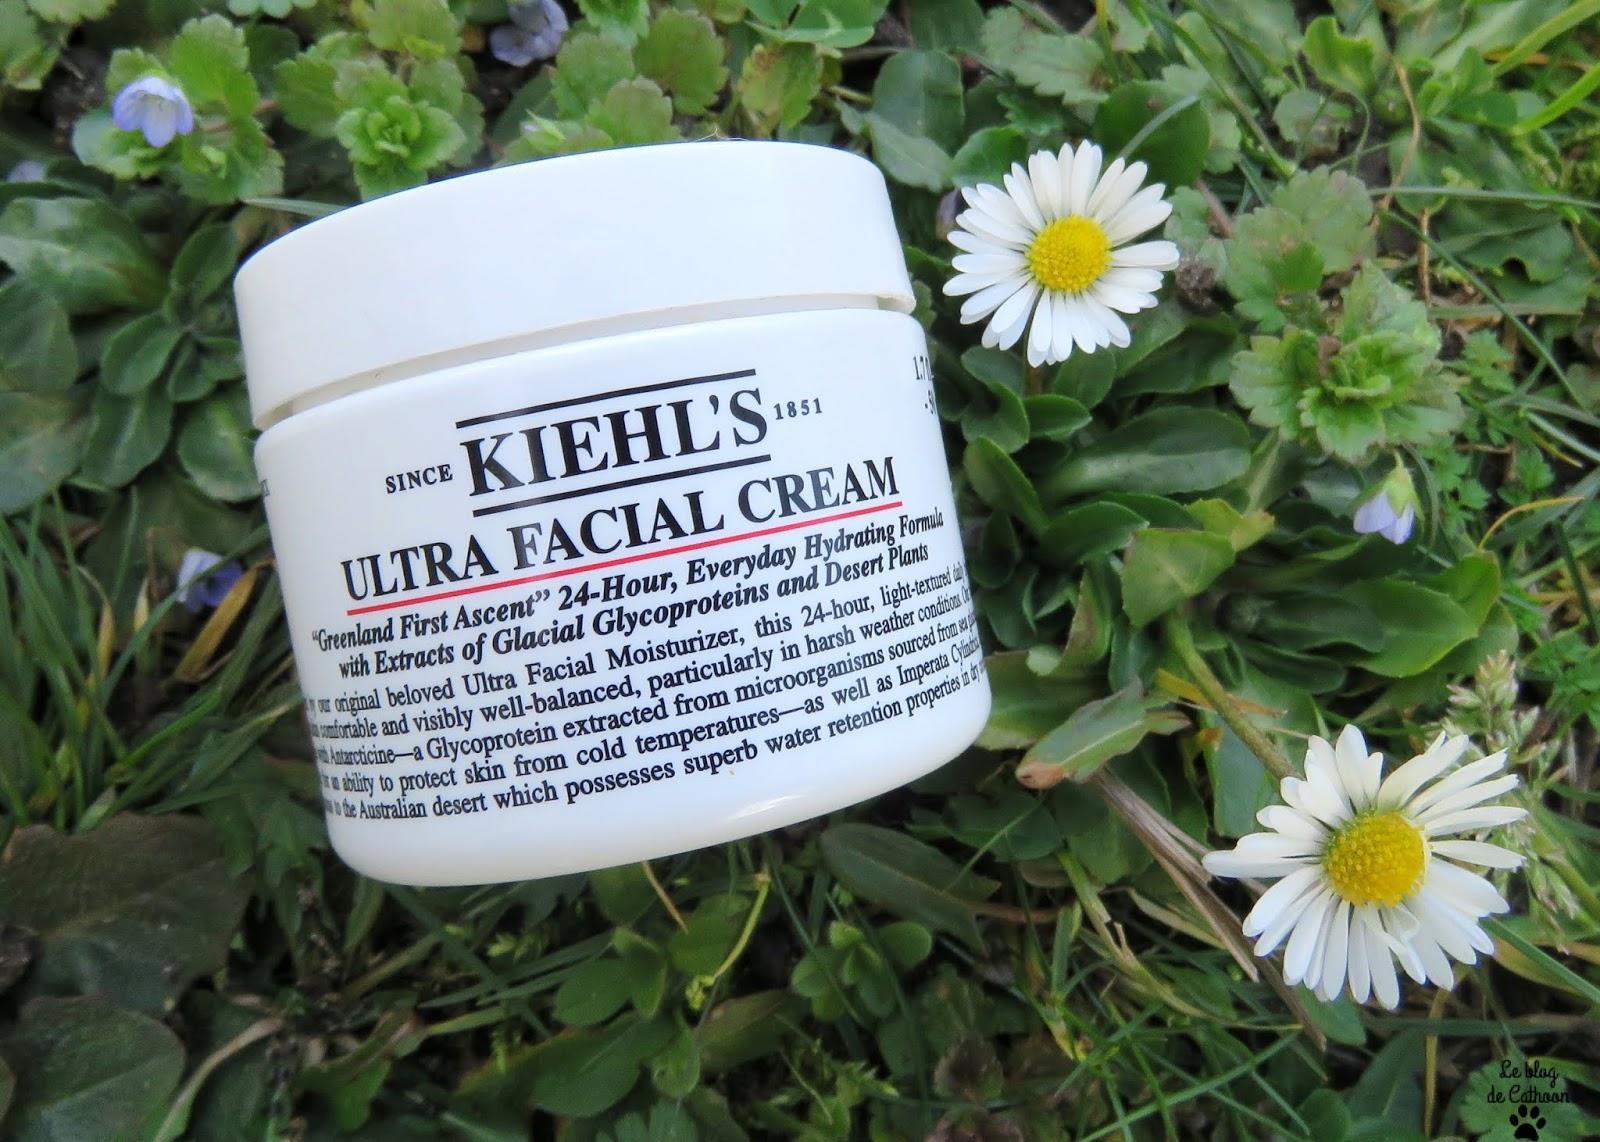 Ultra Facial Cream - Crème Hydratante - Kiehl's